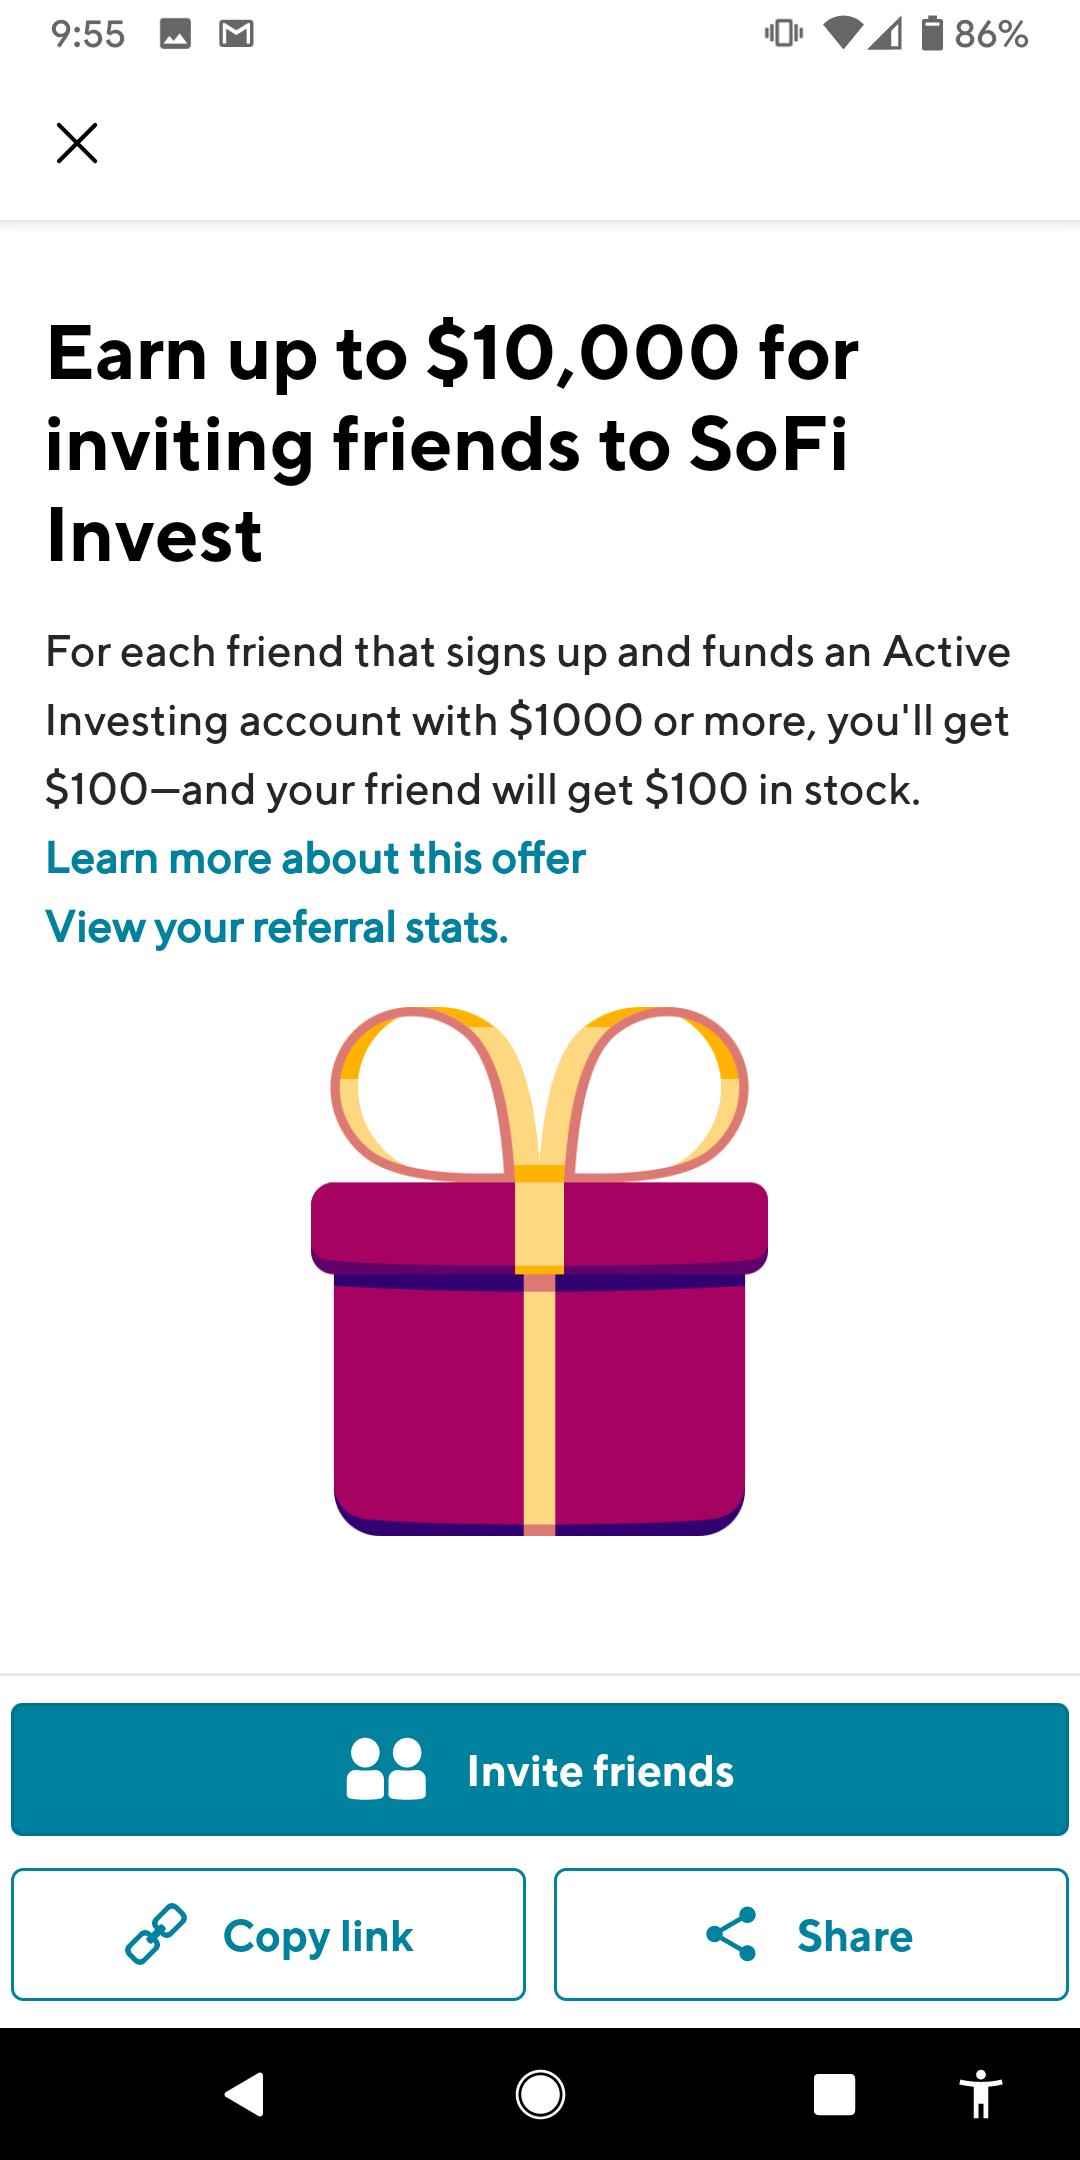 SoFi Invest - $100 bonus after $1000 deposit (additional $25 bonus available for optional crypto trade)